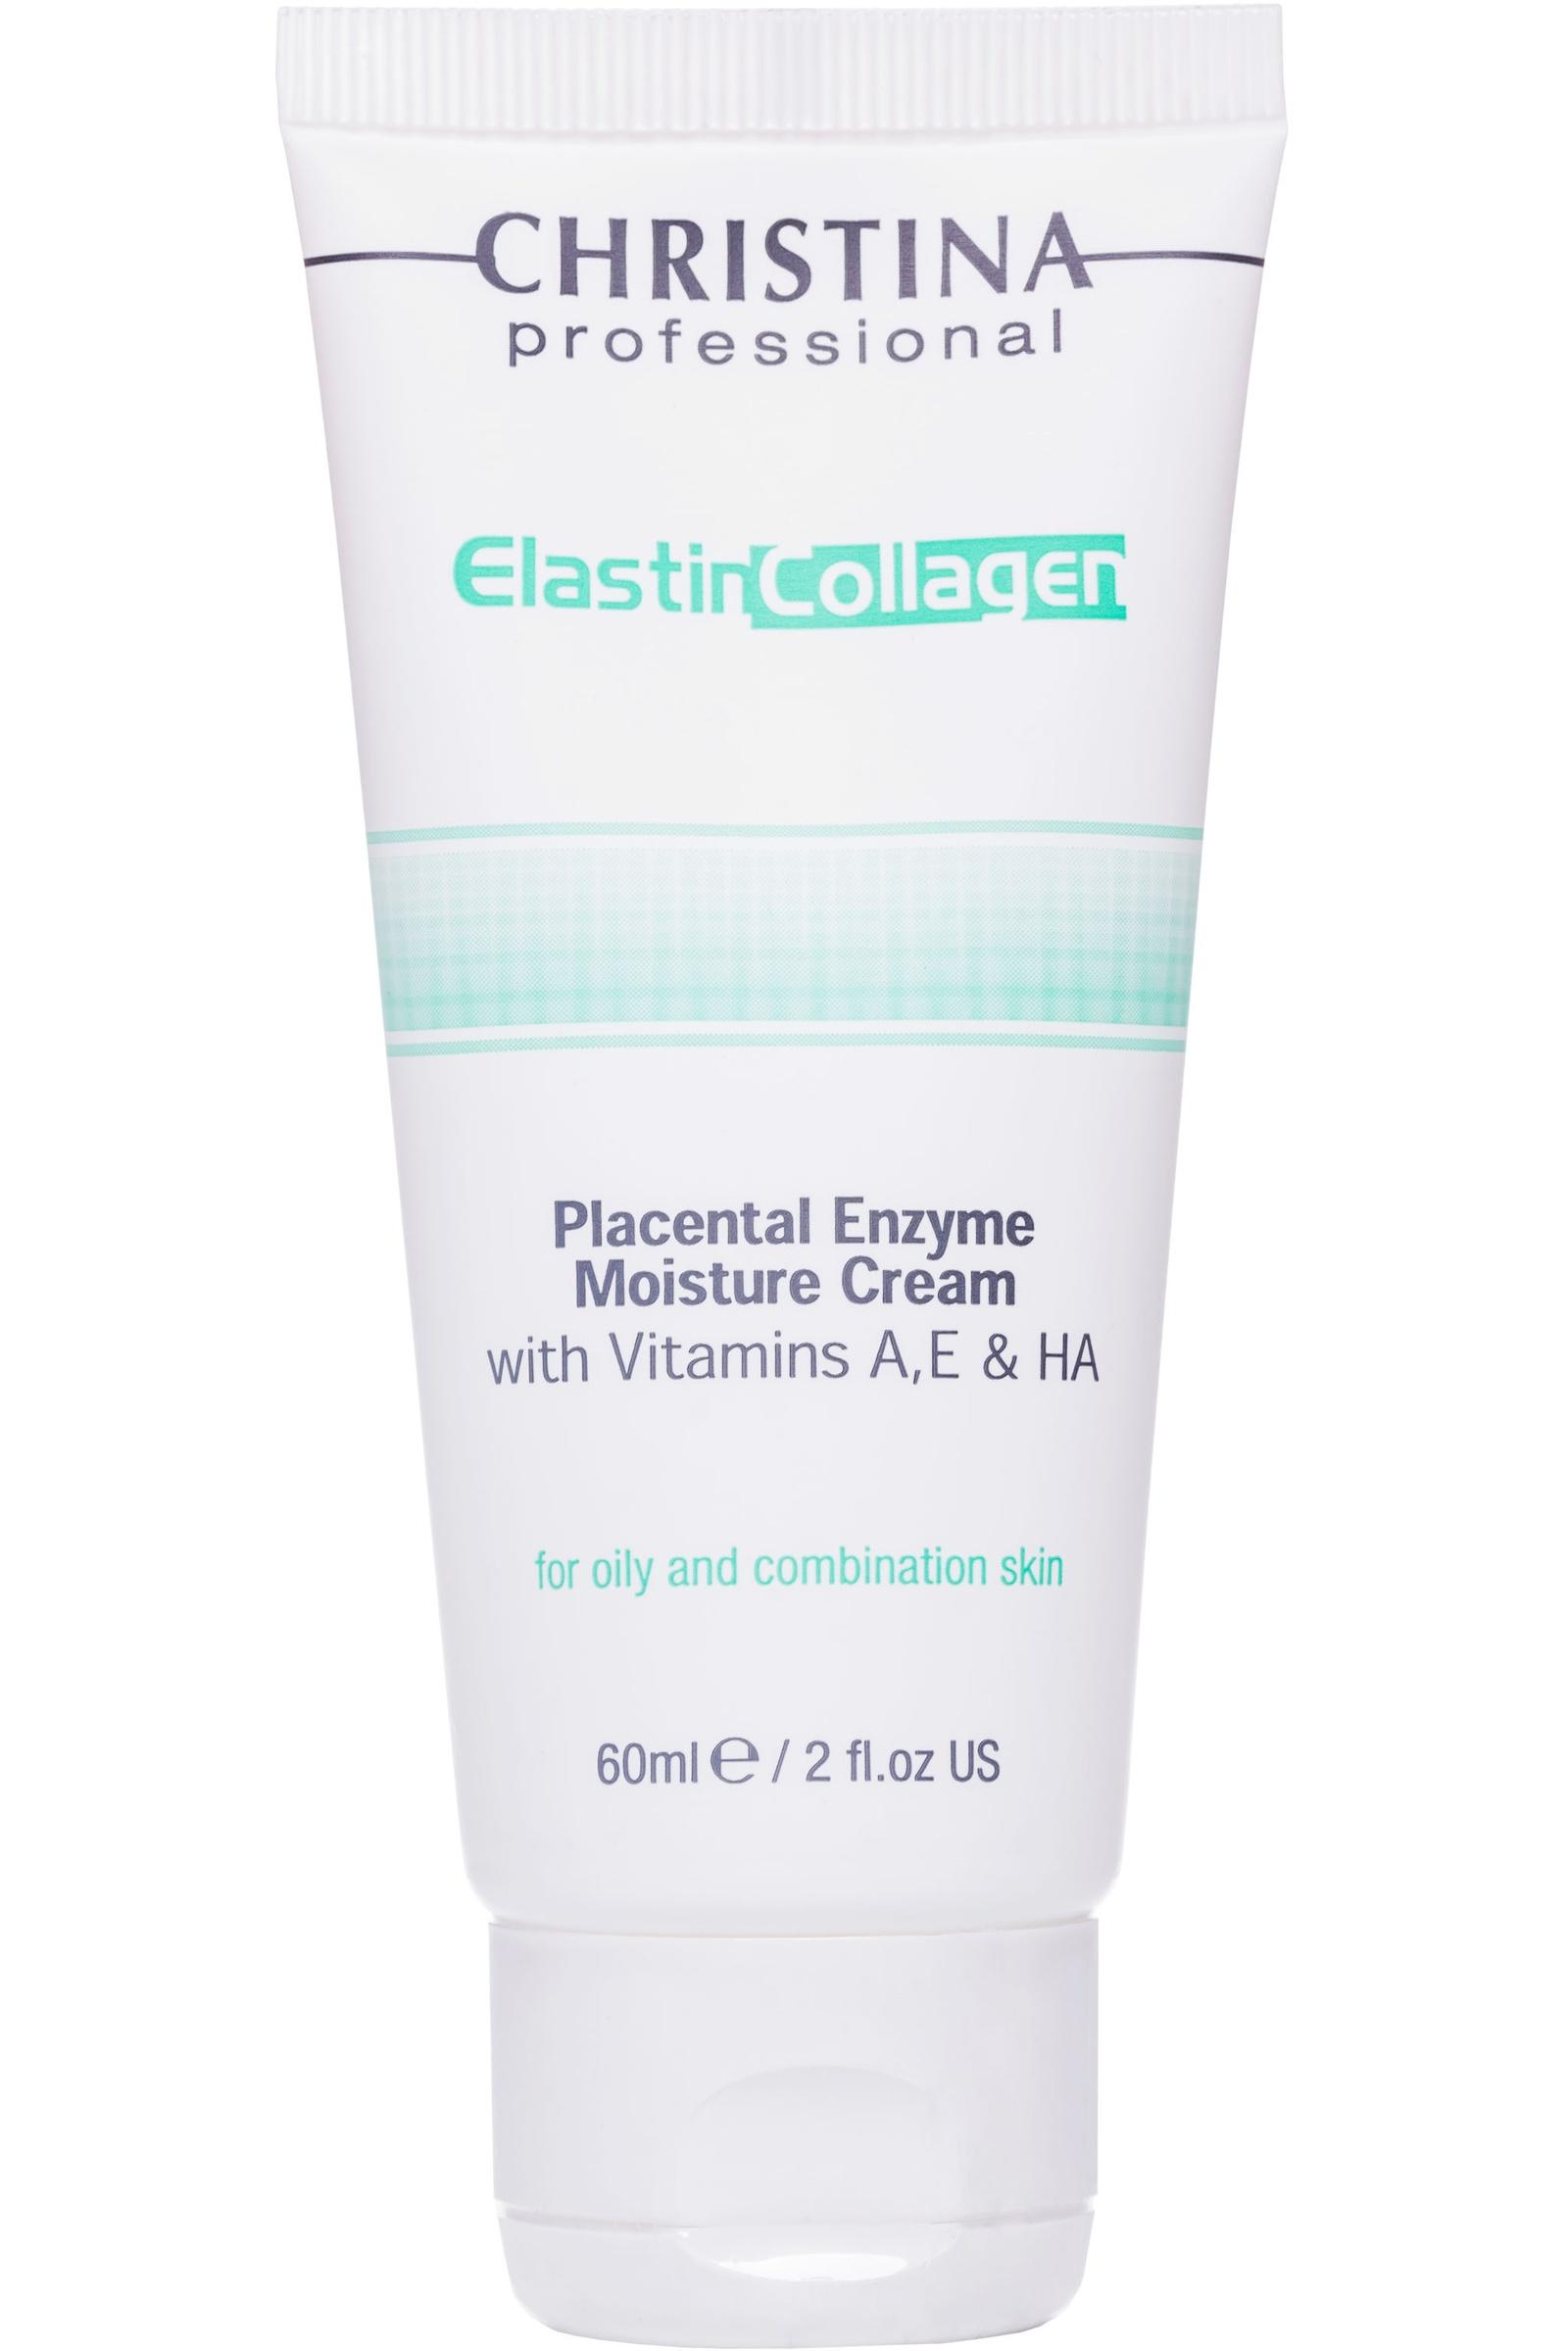 Крем для ухода за кожей CHRISTINA Увлажняющий крем для жирной кожи ElastinCollagenPlacentalEnzymeMoisture Cream withVit.A,E & HA for oily цена